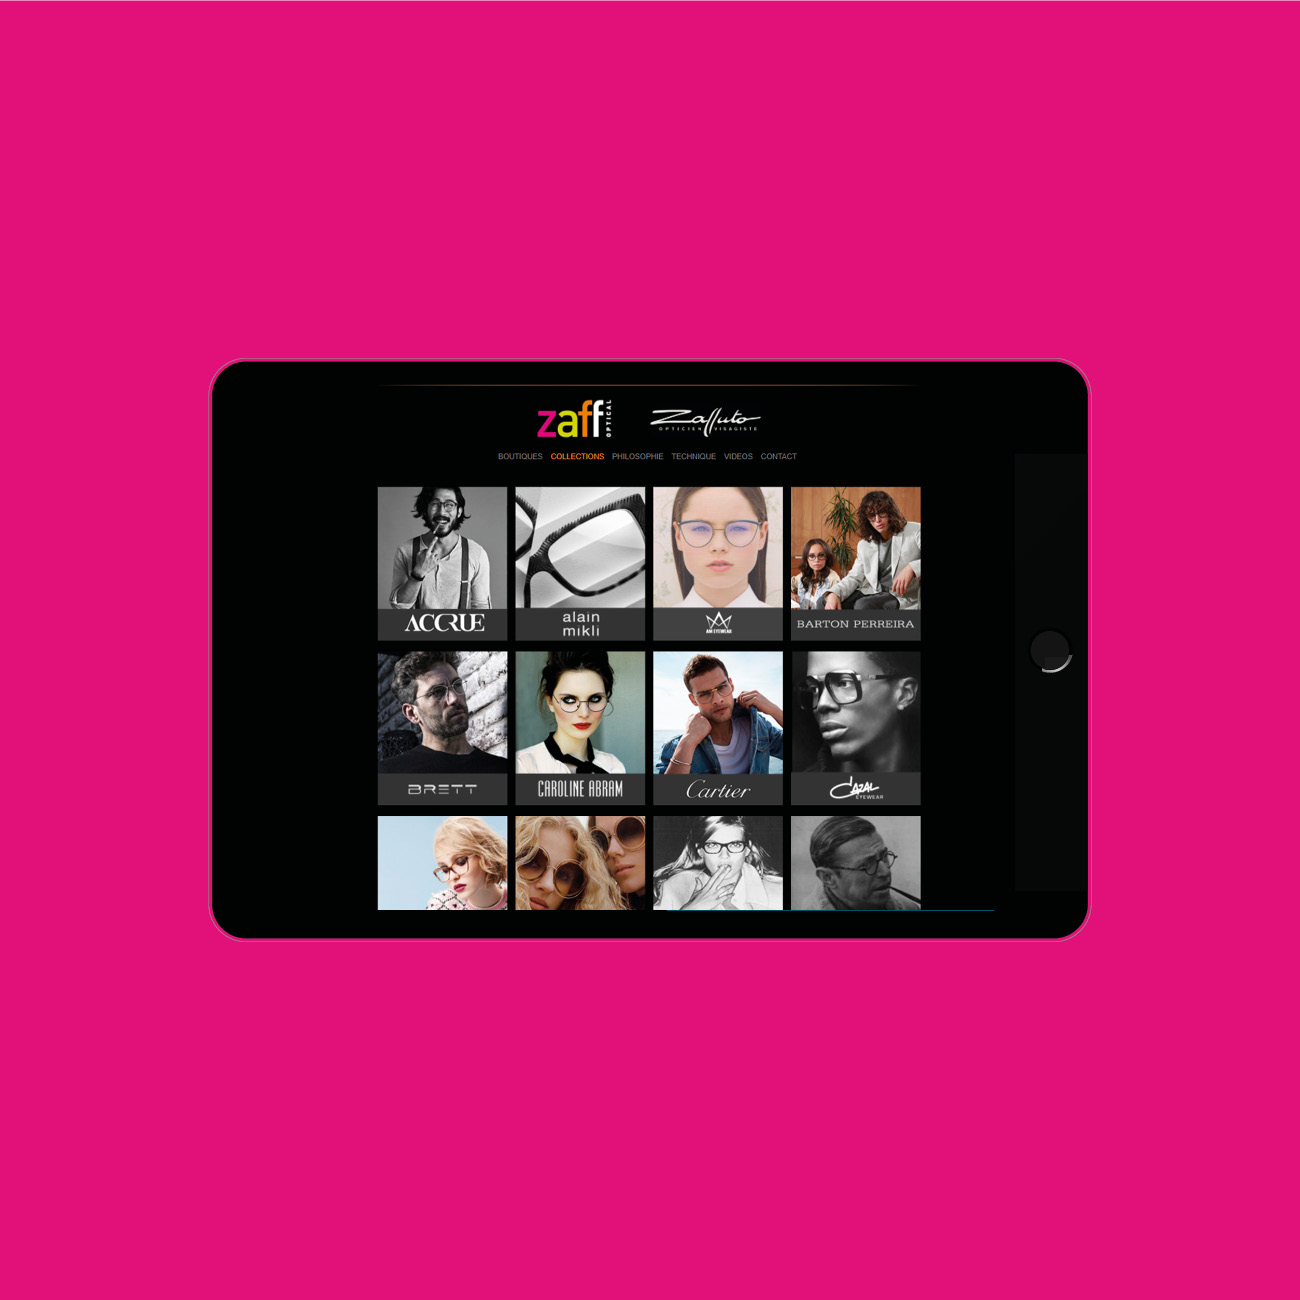 Miko Digital Agence web à Liège - Site internet pour Zaff Optical